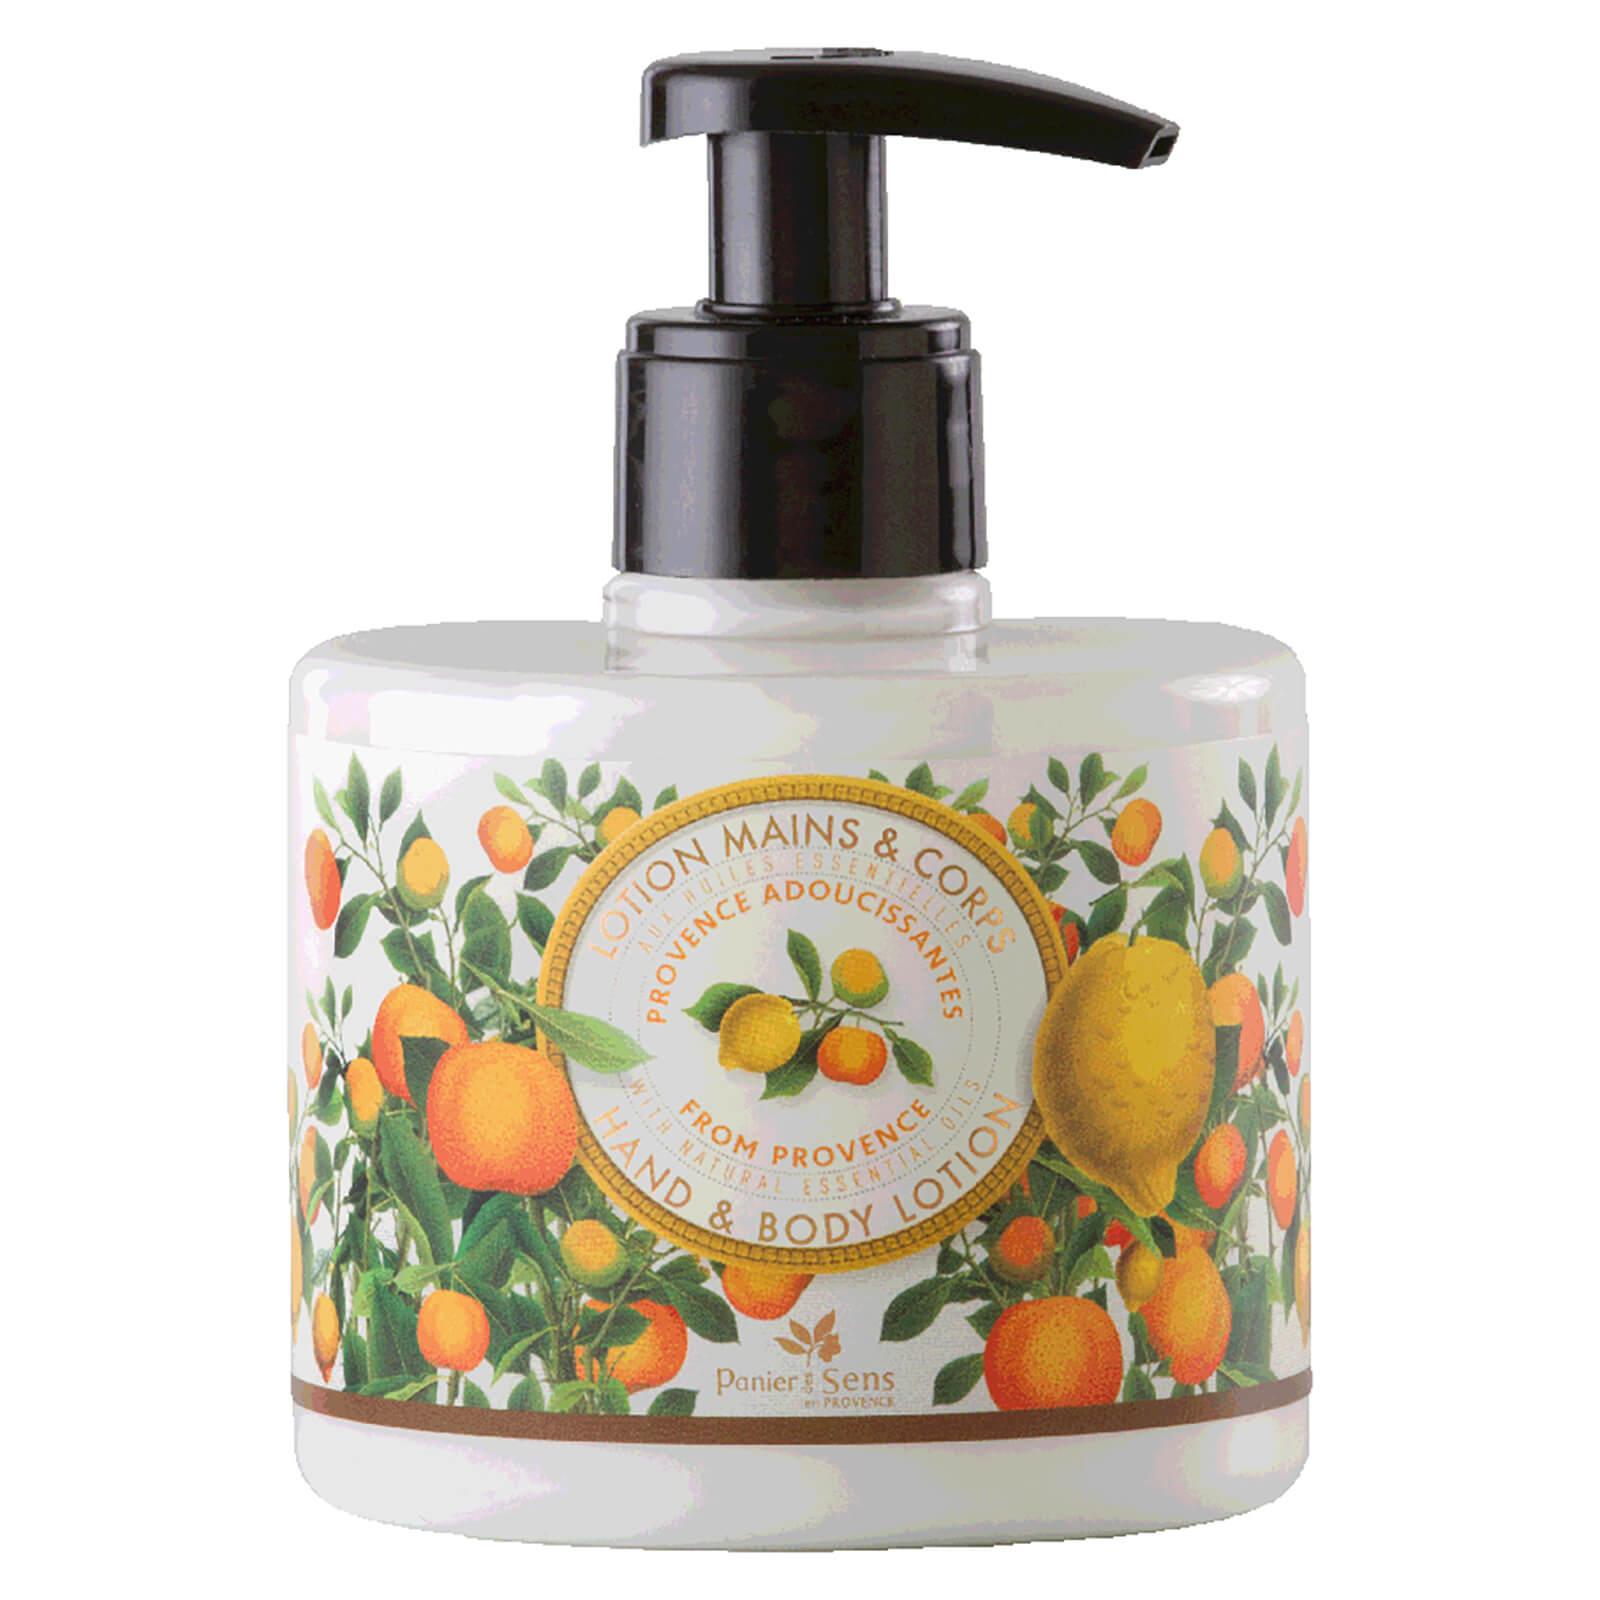 Panier des Sens The Essentials Provence Essential Oils Hand & Body Lotion